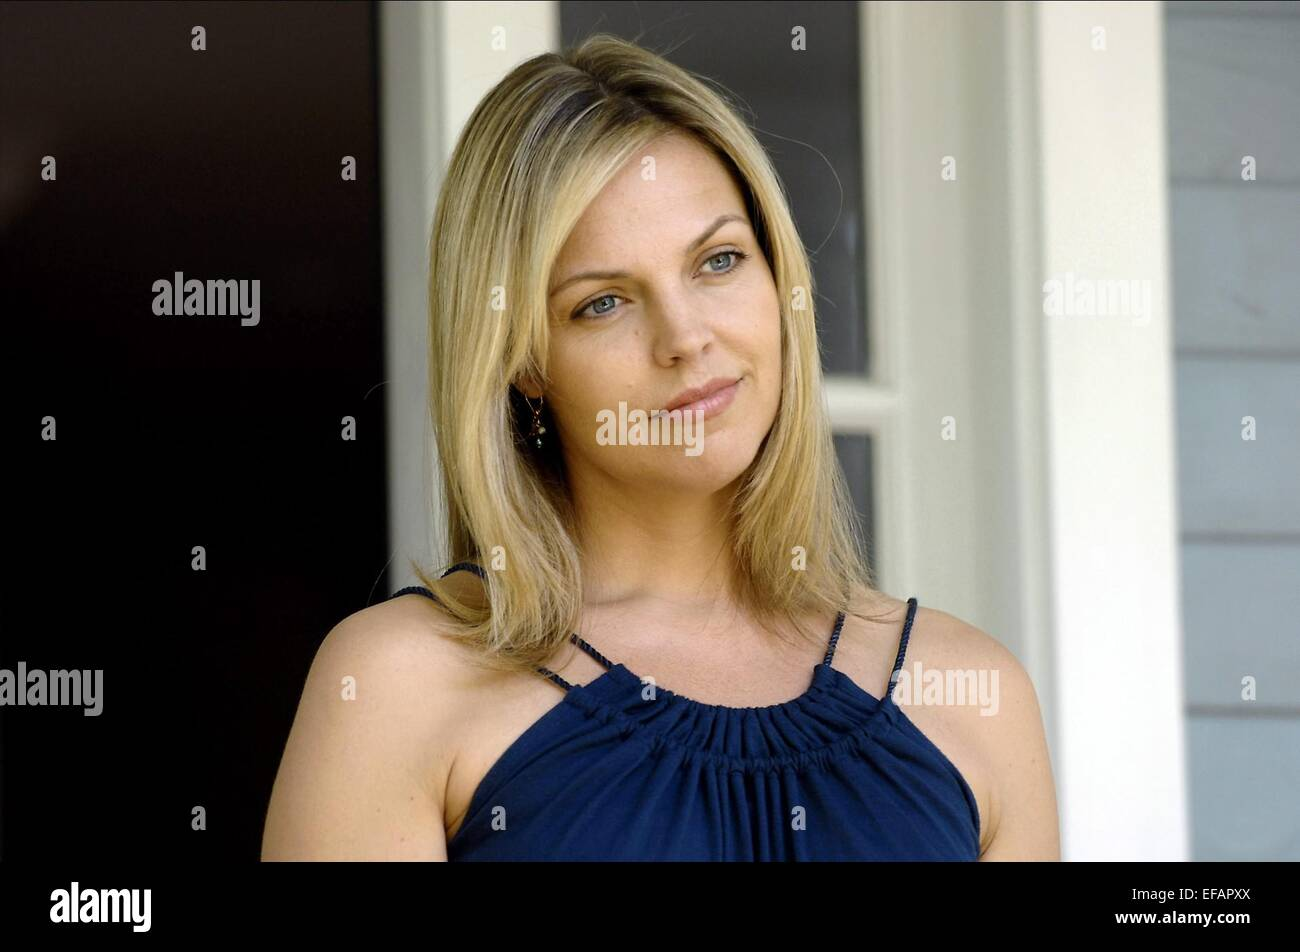 Melissa Ricks (b. 1990) Erotic video Linda Park,Leila Kenzle